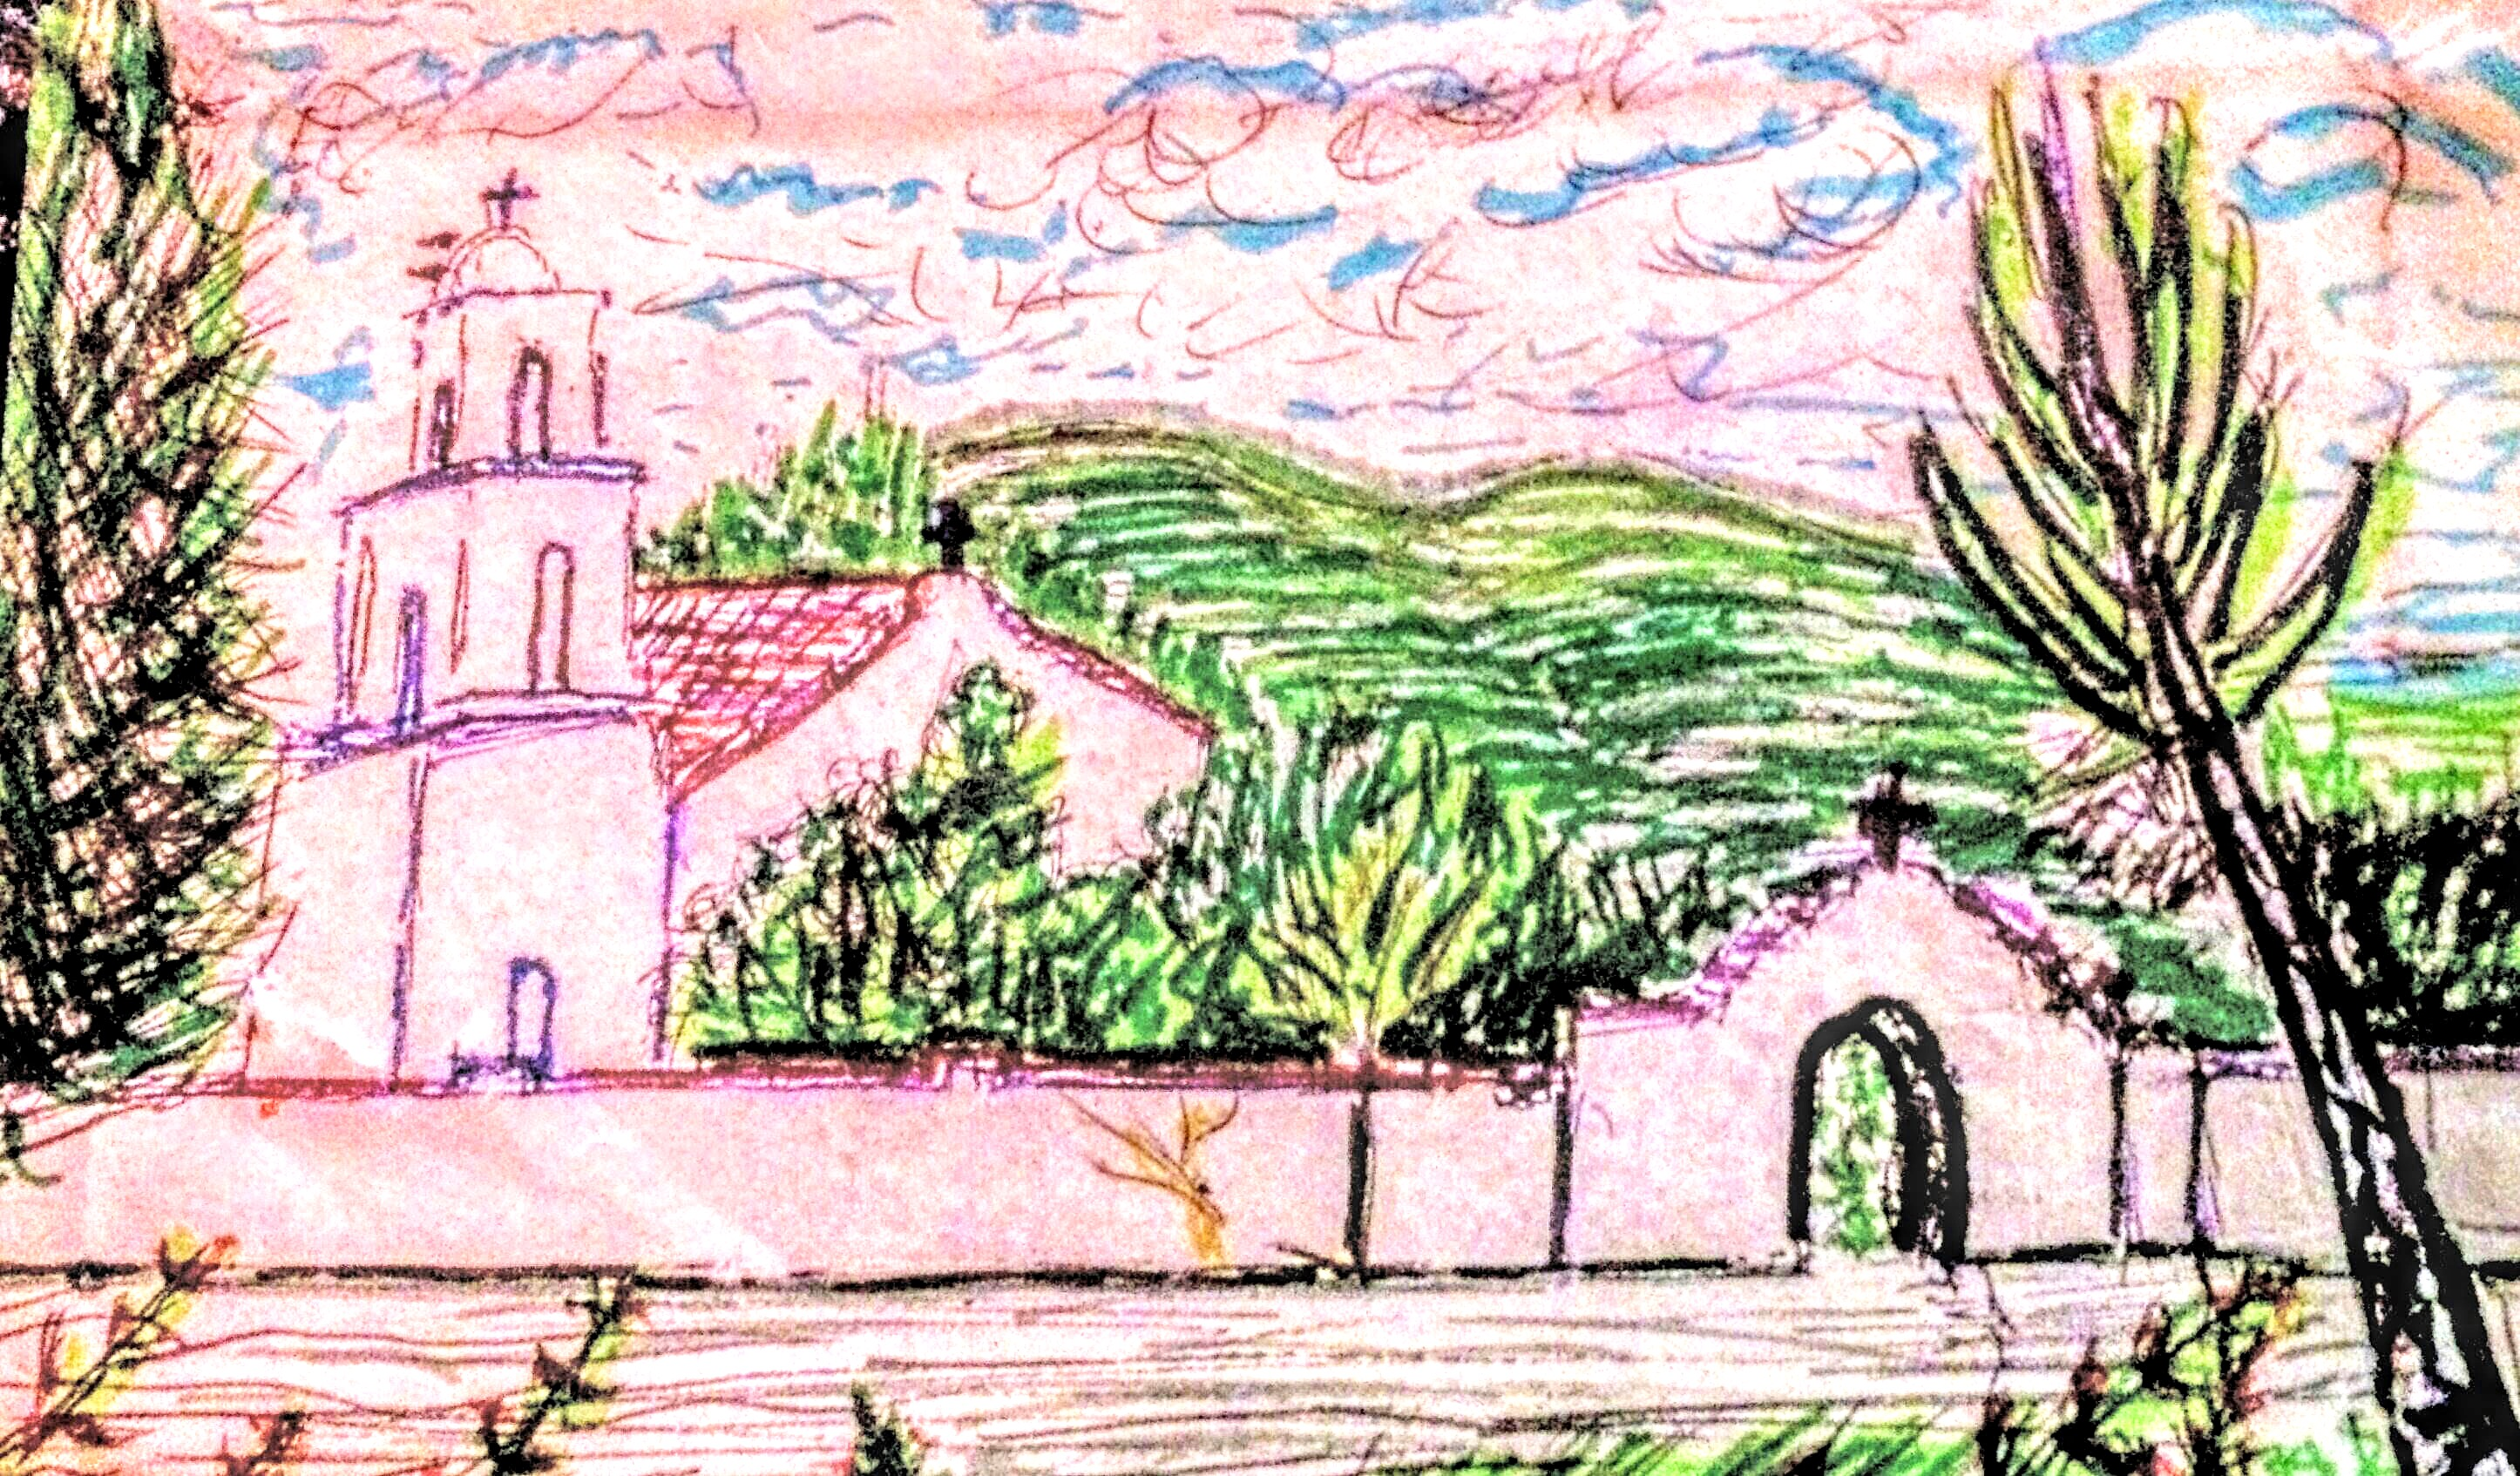 Xirkholatl image